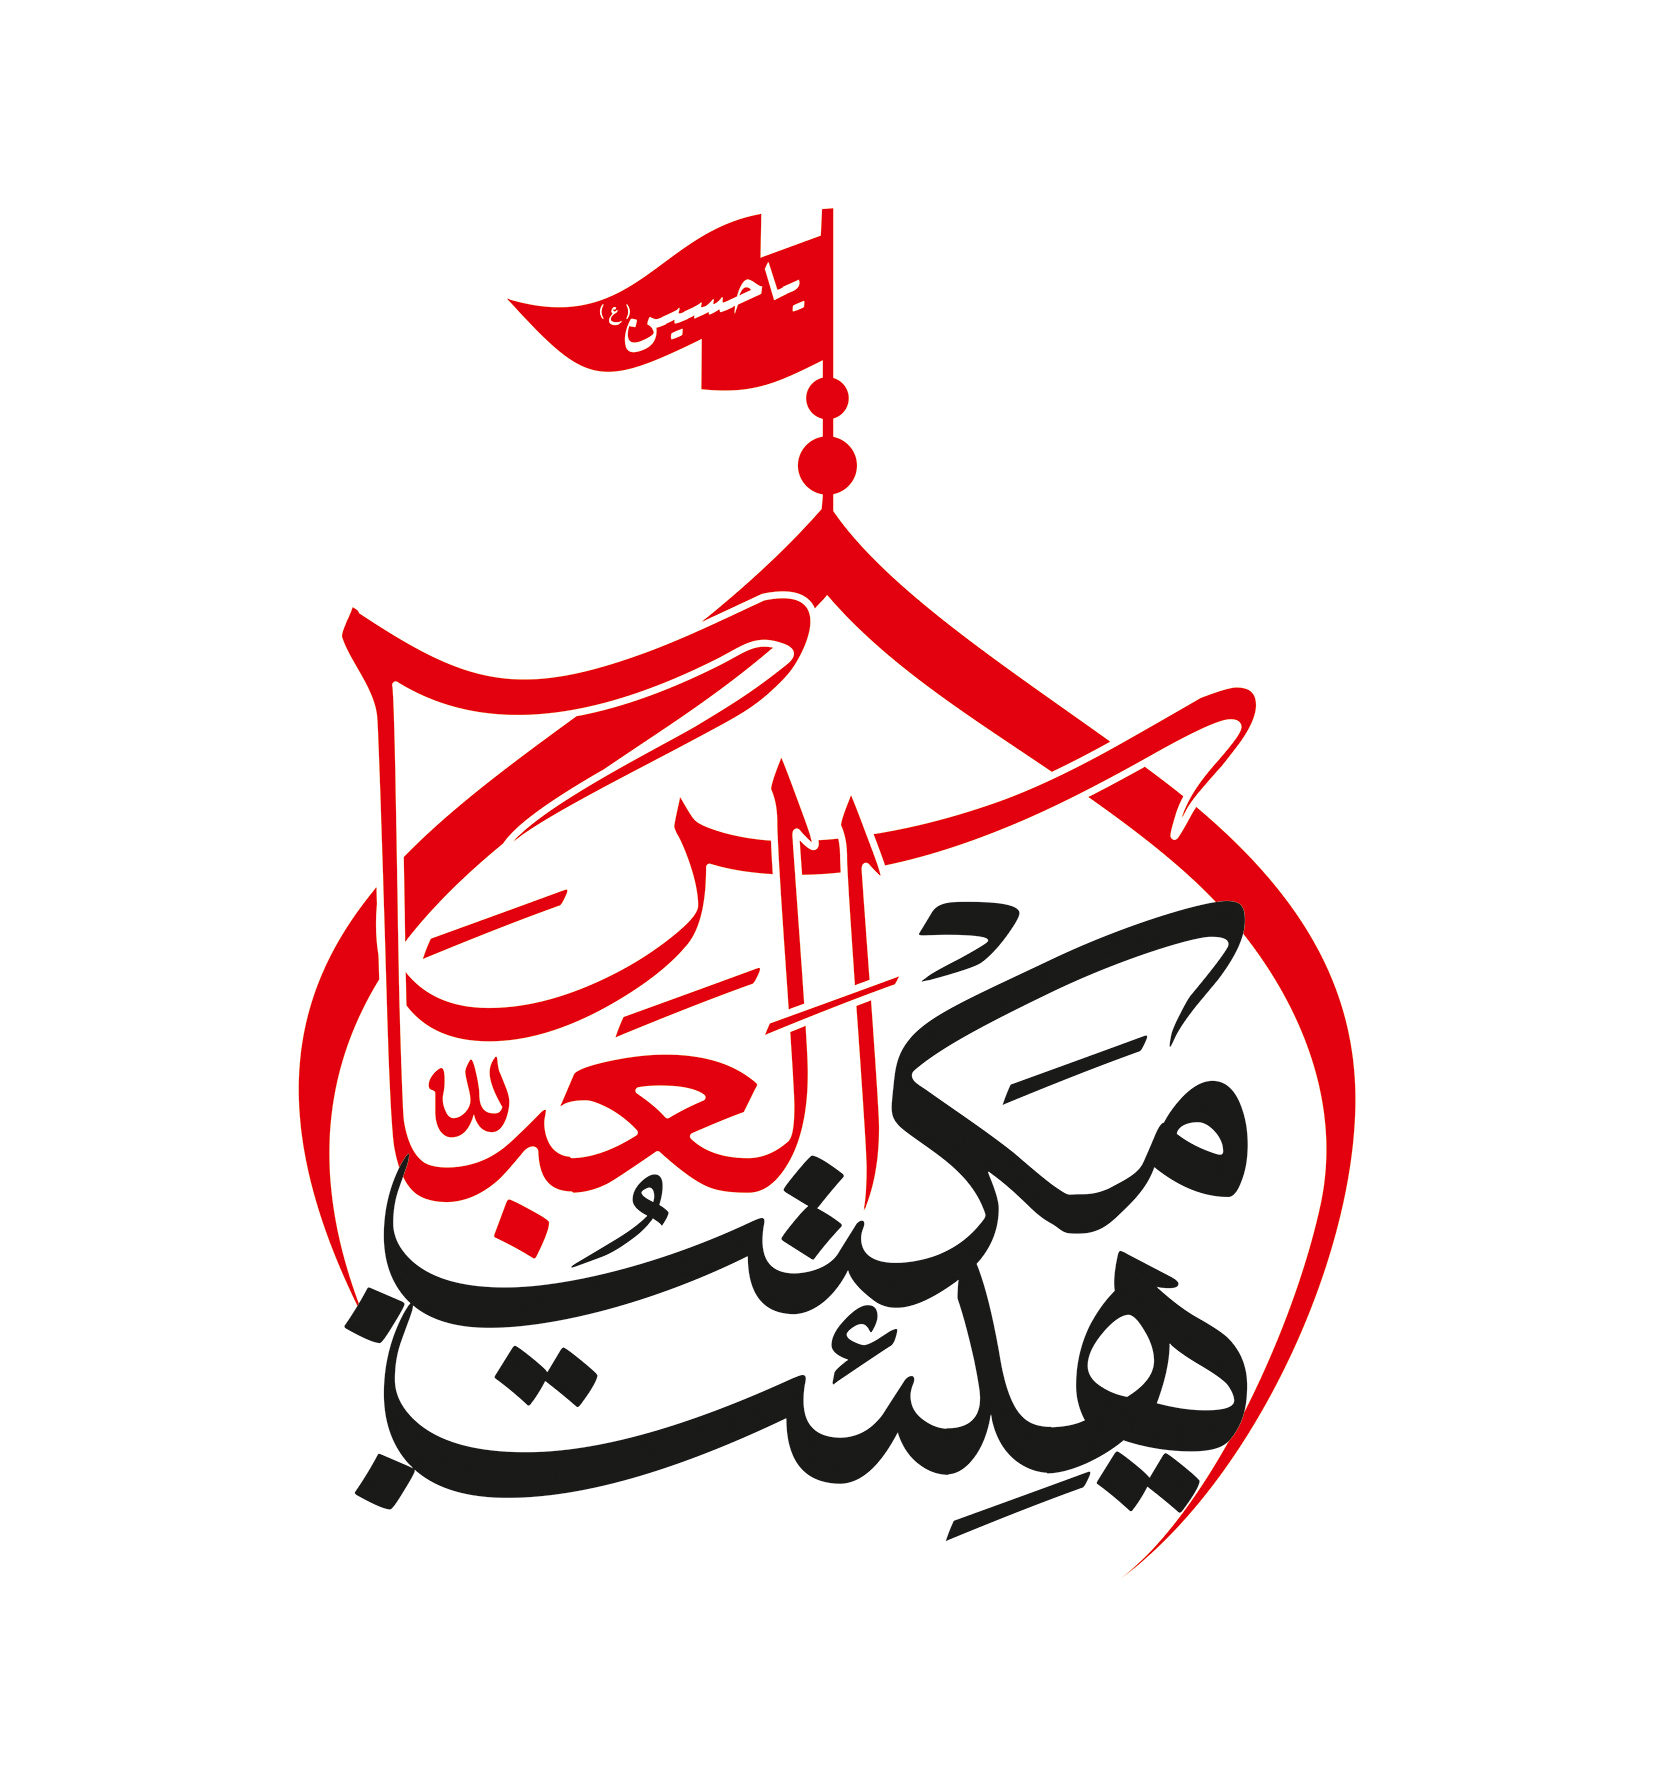 فایل صوتی مراسم جشن میلاد پیامبر اکرم (ص) و امام صادق (ع)